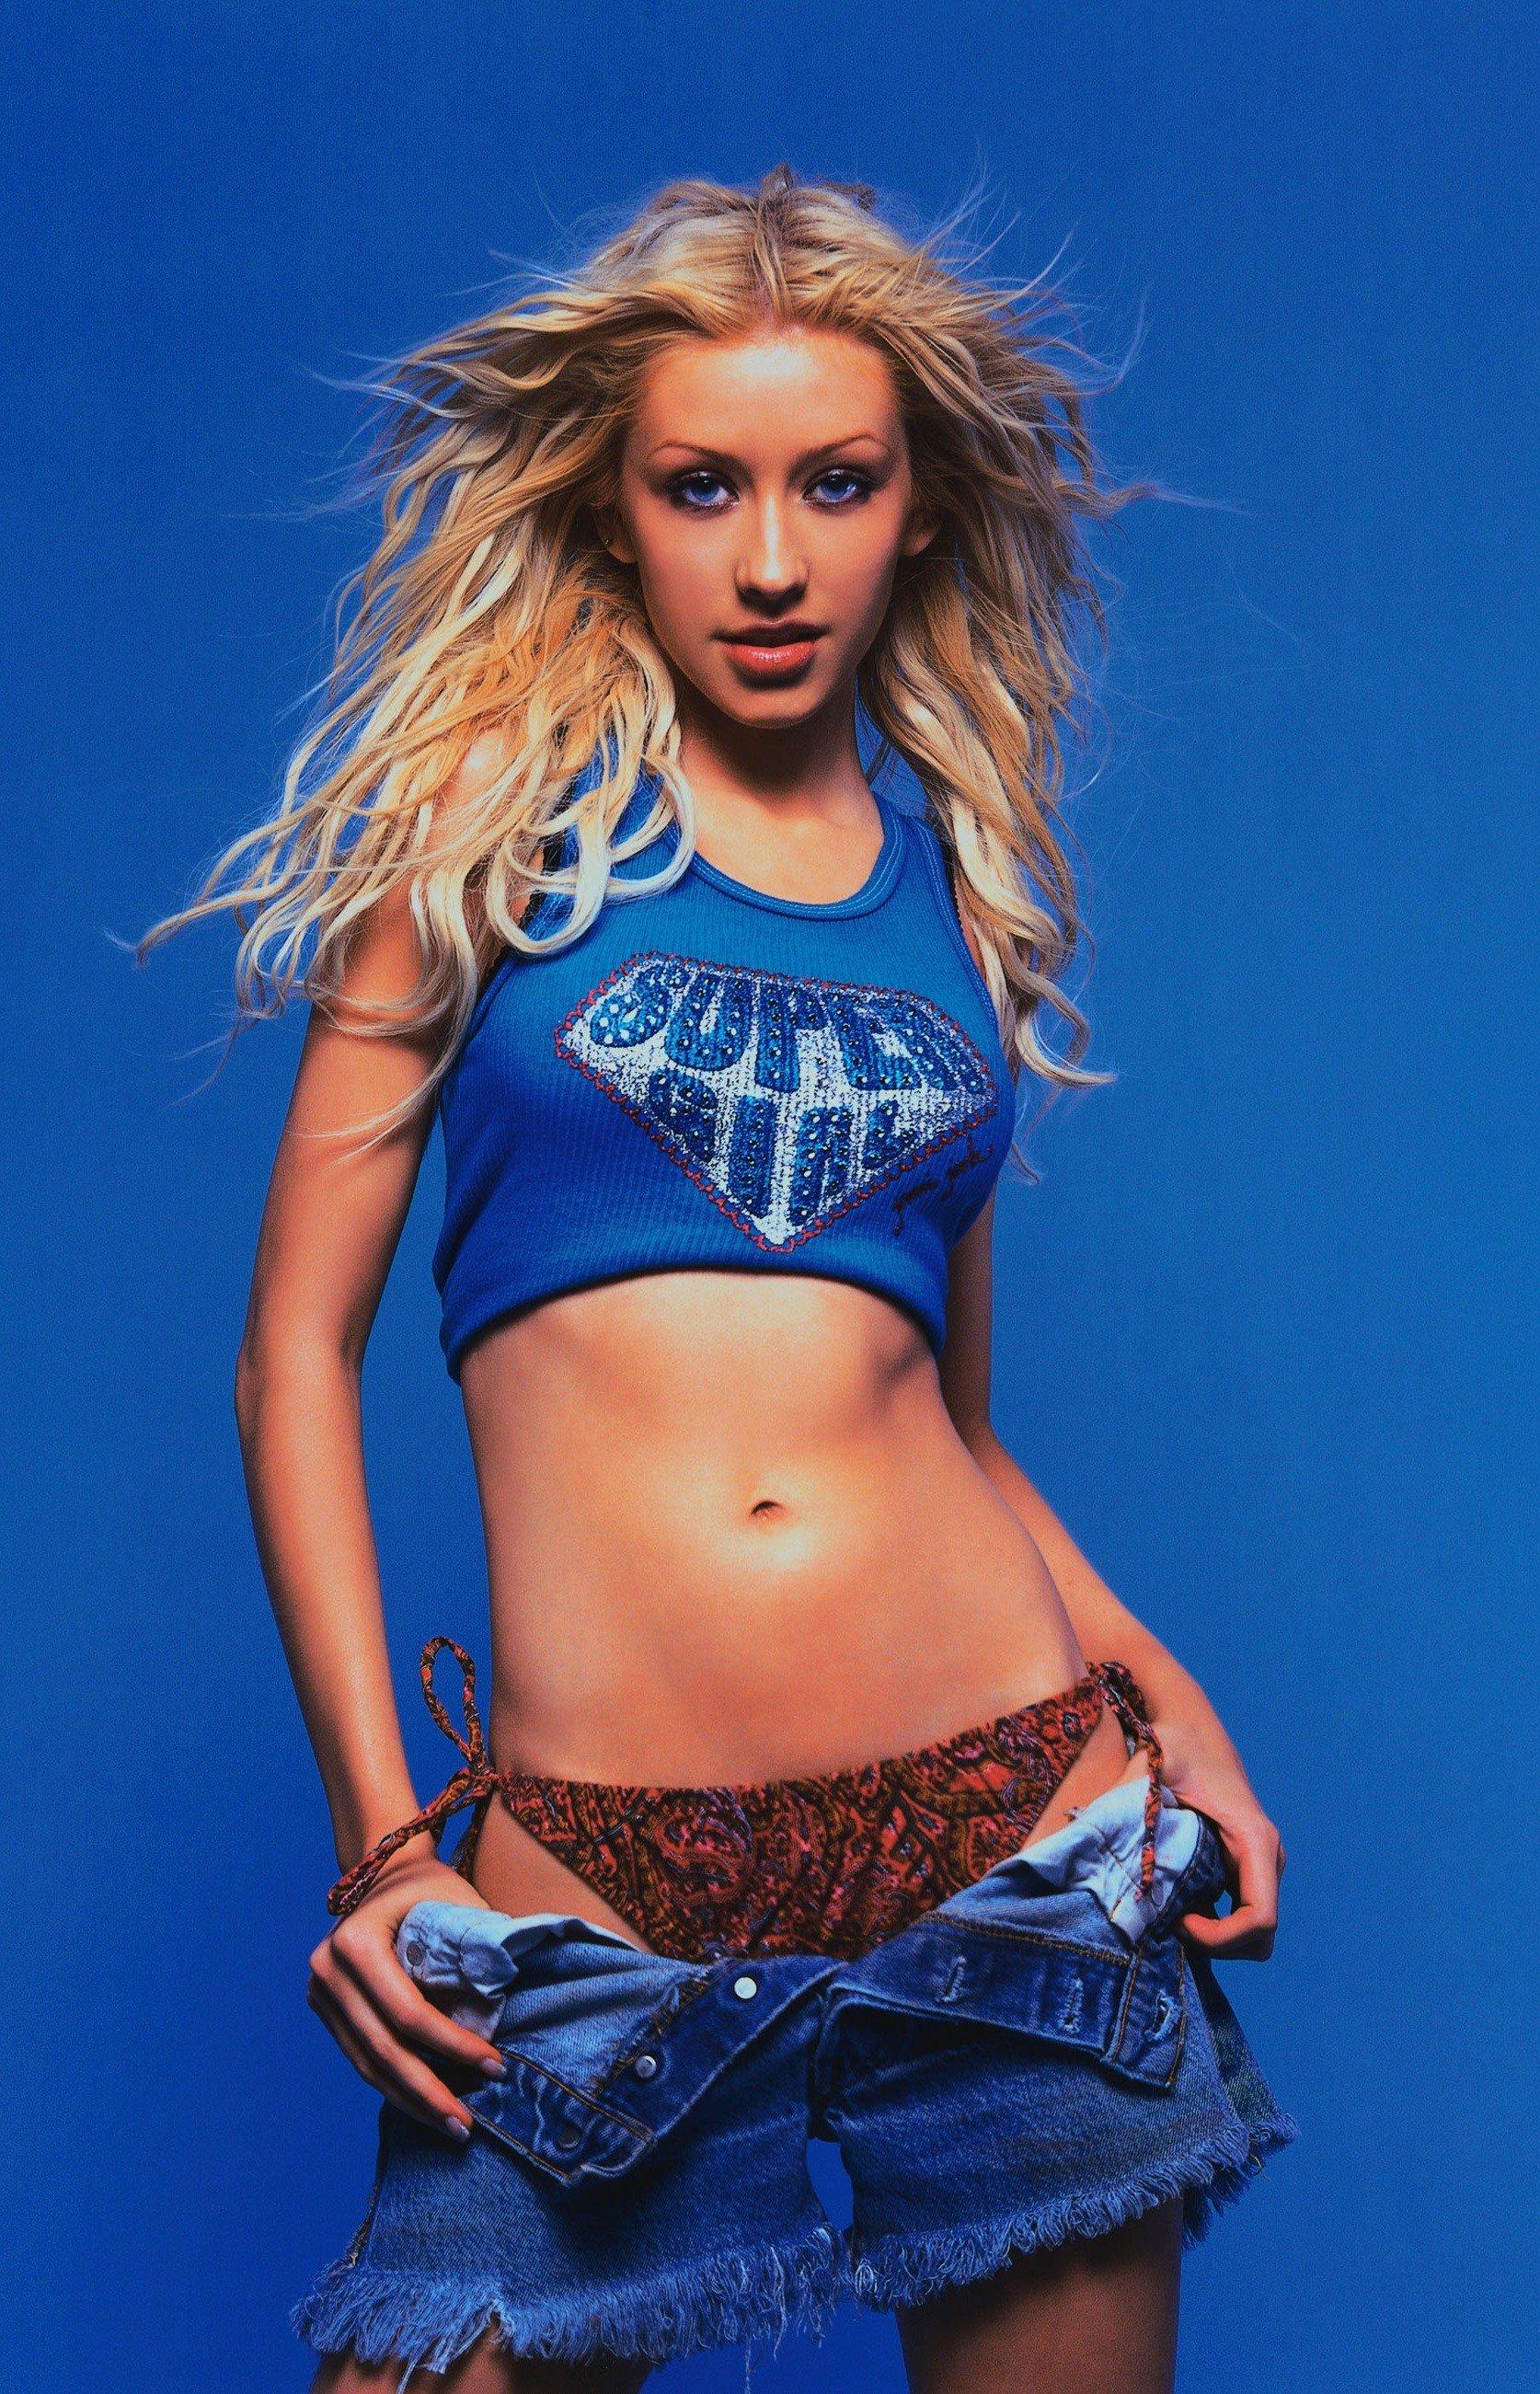 56418_Christina_Aguilera-014375_Rolling_Stone_2000_122_1198lo.jpg